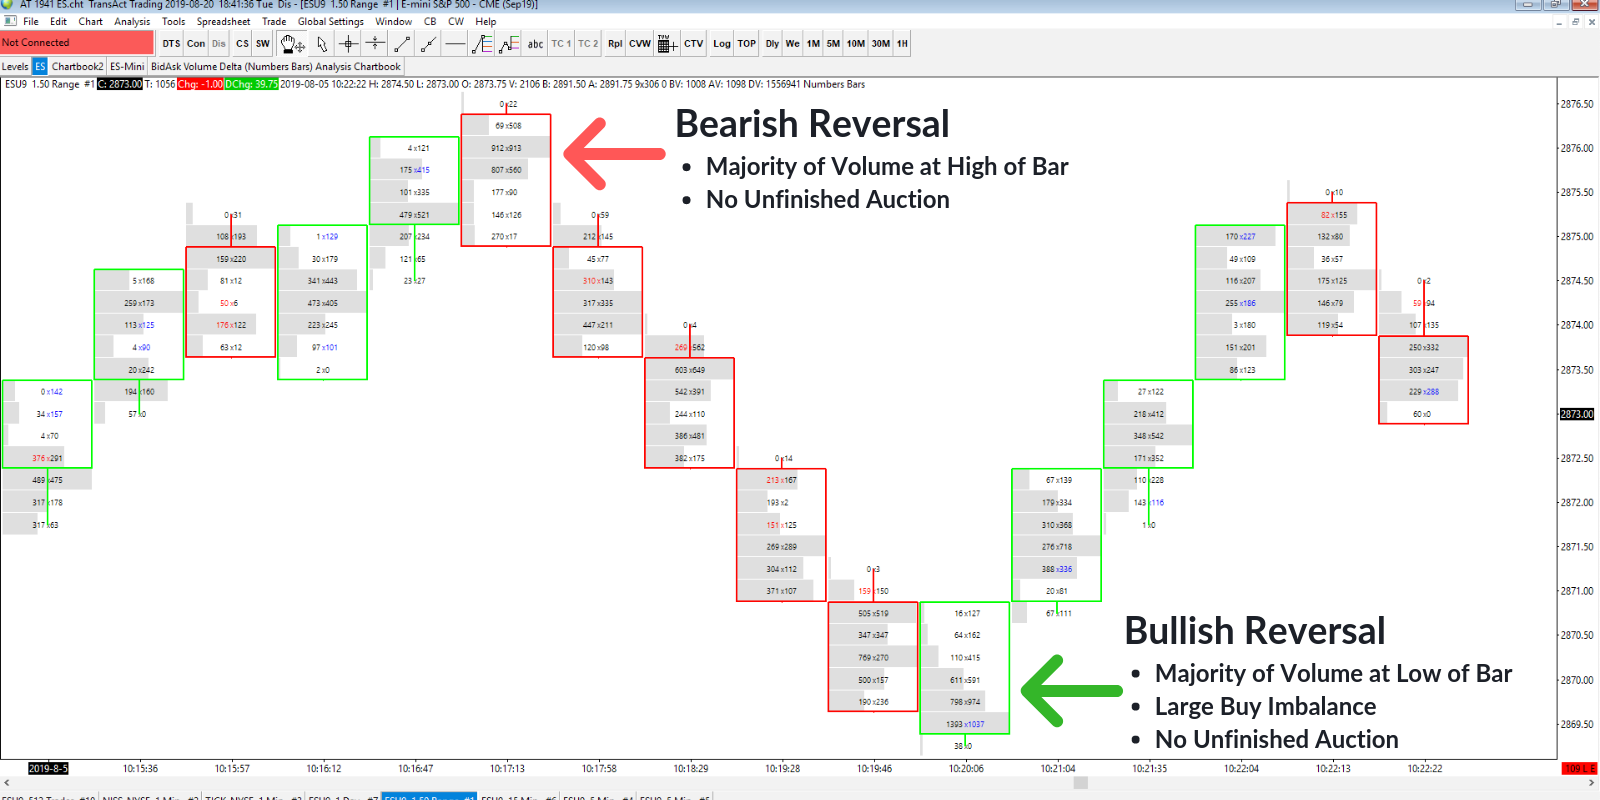 Bearish and Bullish Volume Profiles